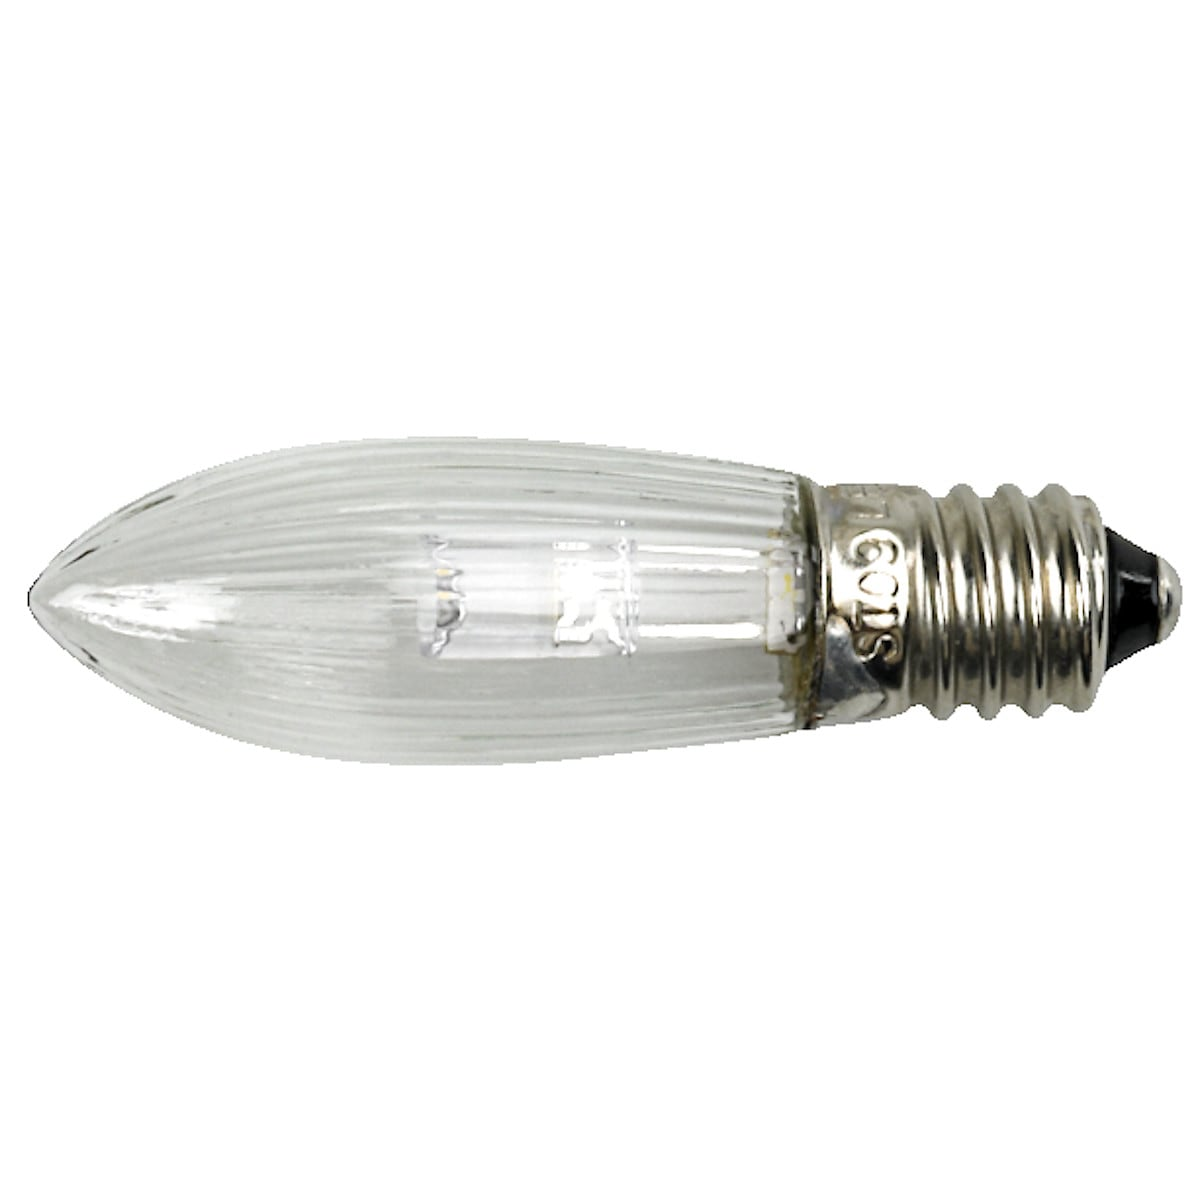 Northlight E10 LED Candle Bulbs 10–55 V, 4-pack